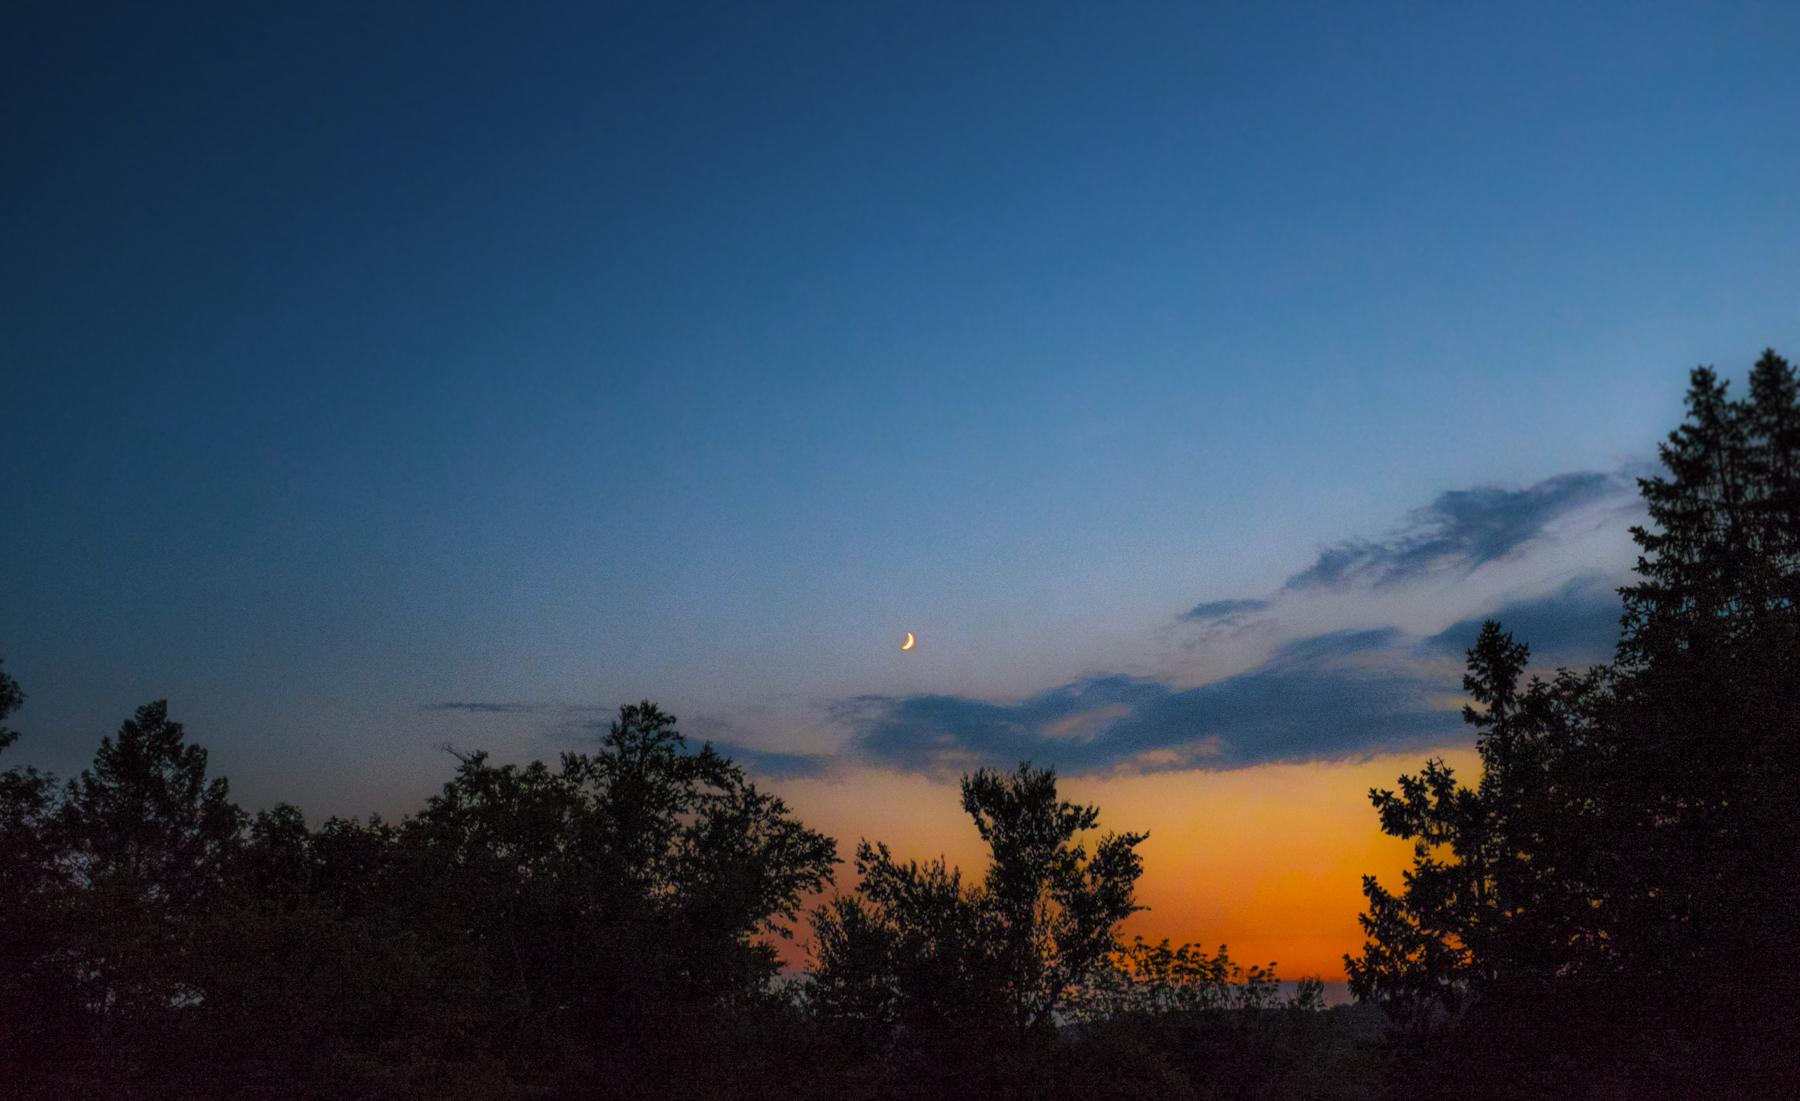 sunset at nannys